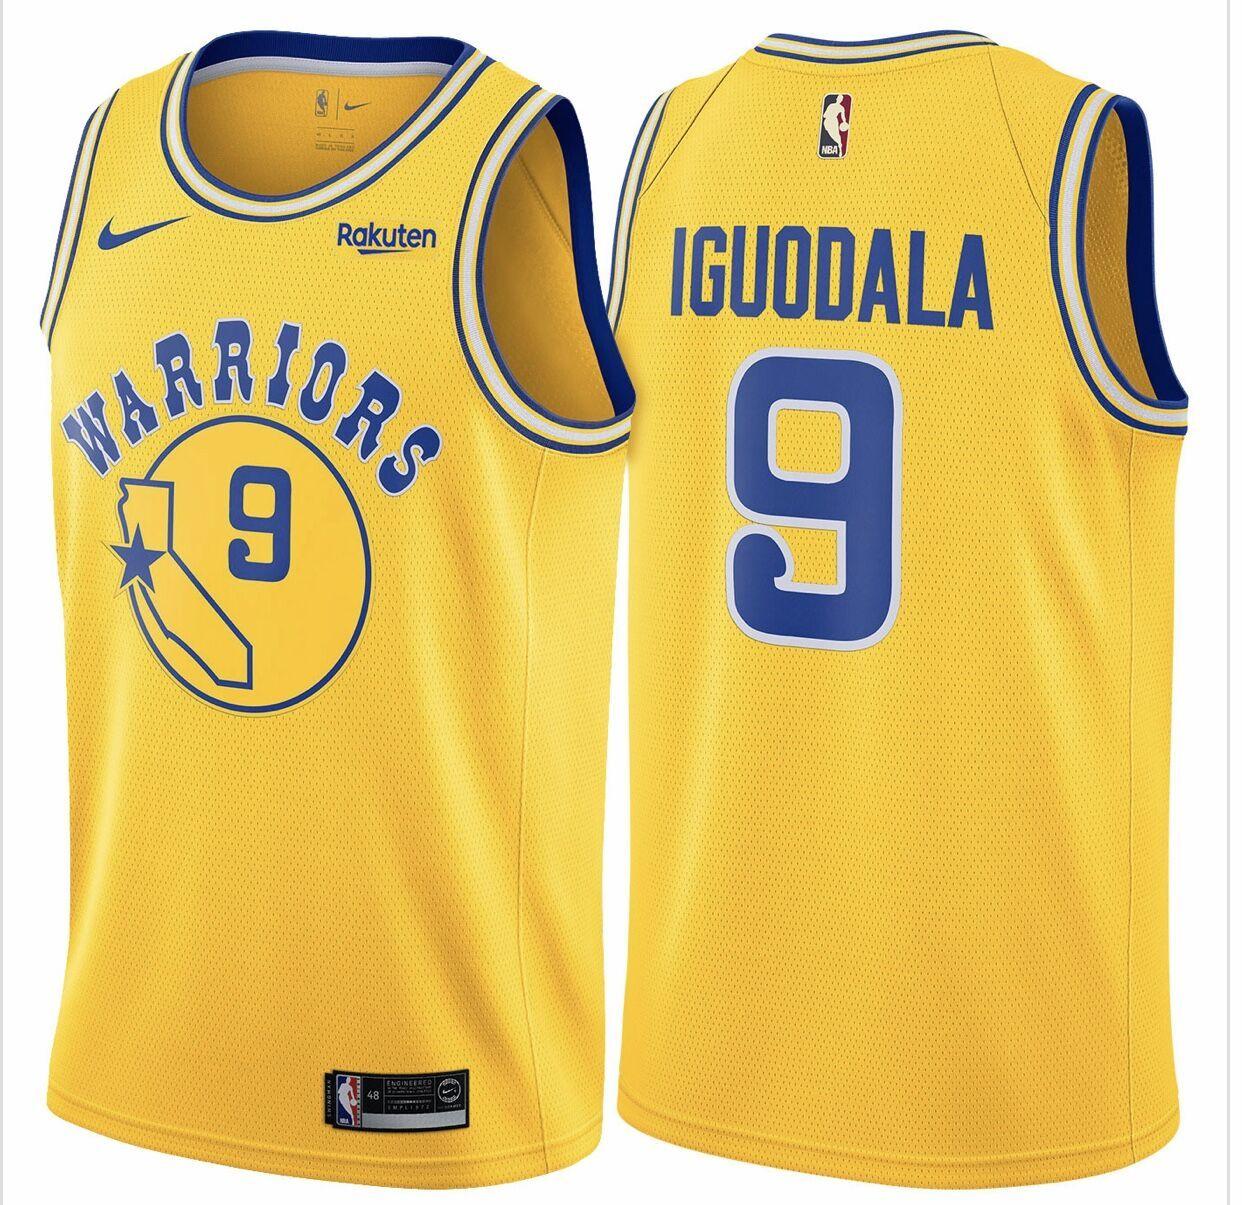 38aa8a1d Nike Warriors #9 Andre Iguodala Gold Throwback NBA Swingman Hardwood  Classics Jersey